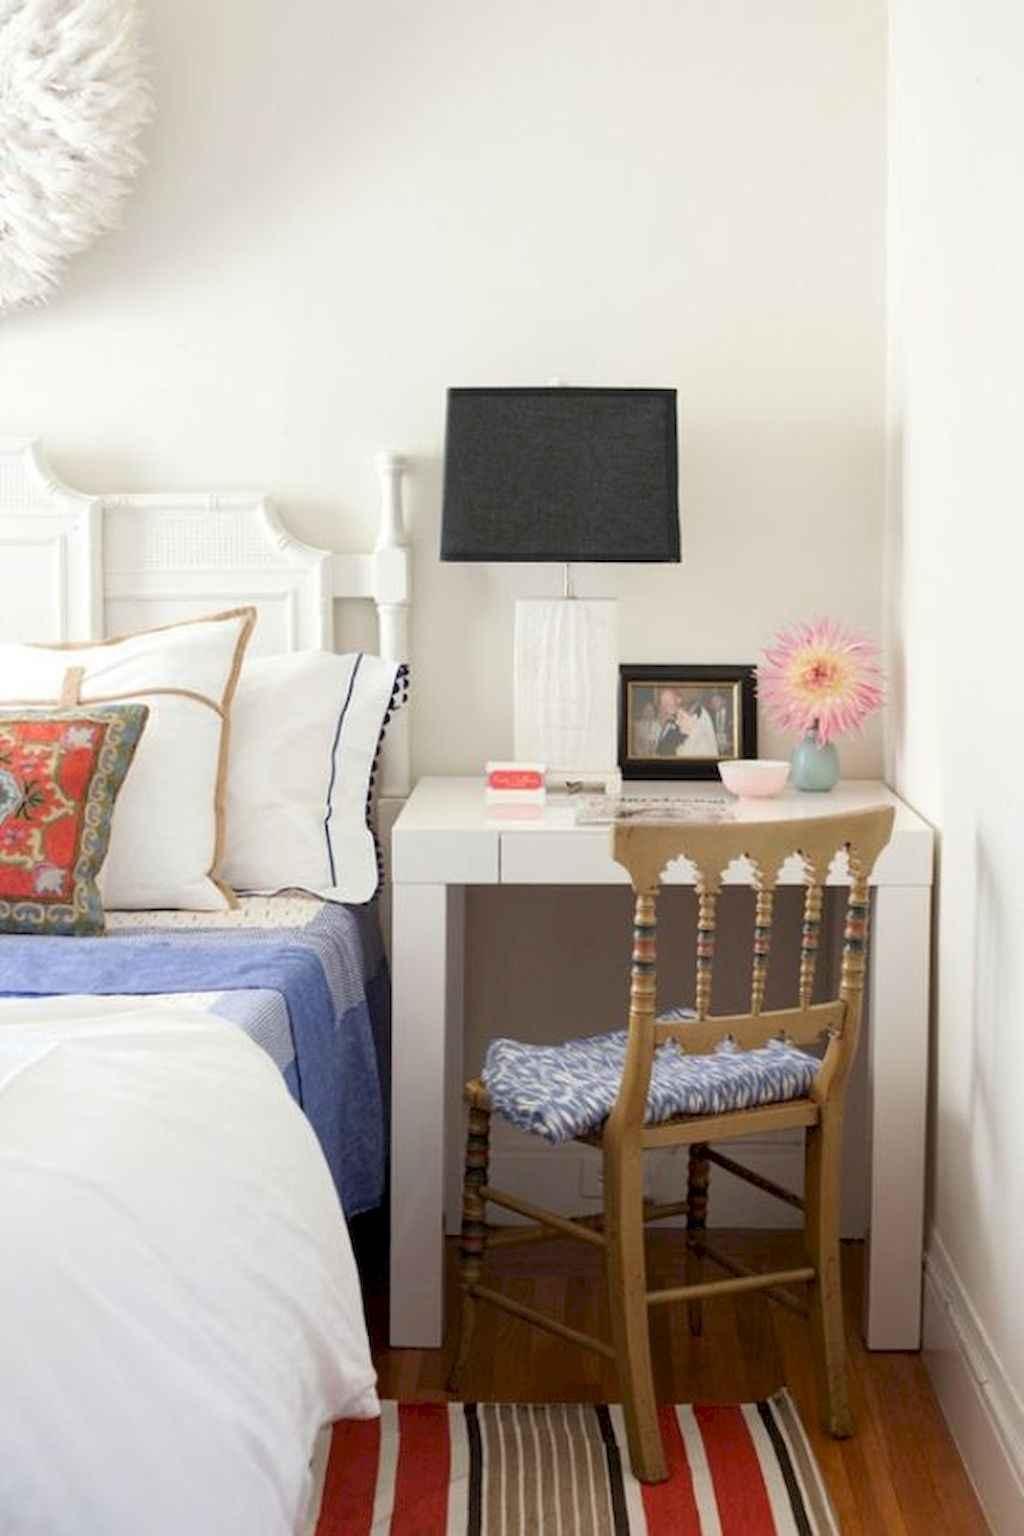 Small apartment decorating ideas (70)